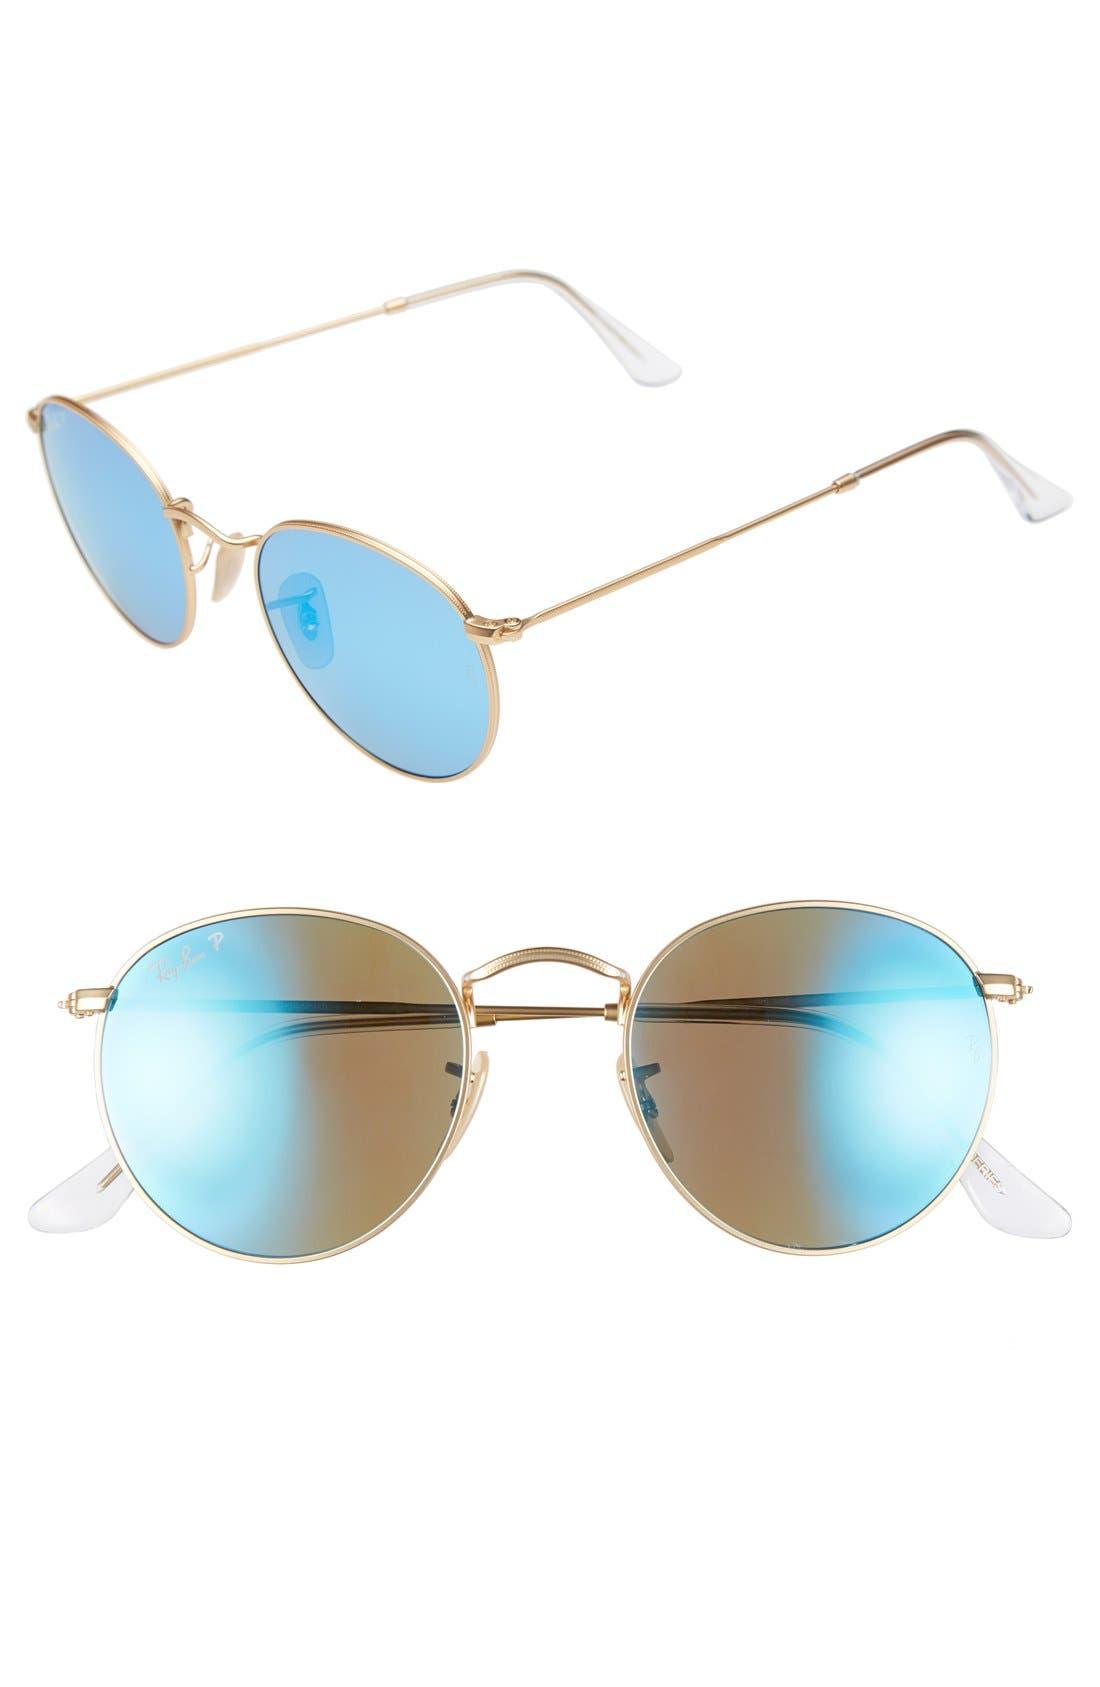 Ray-Ban 50Mm Round Polarized Sunglasses -